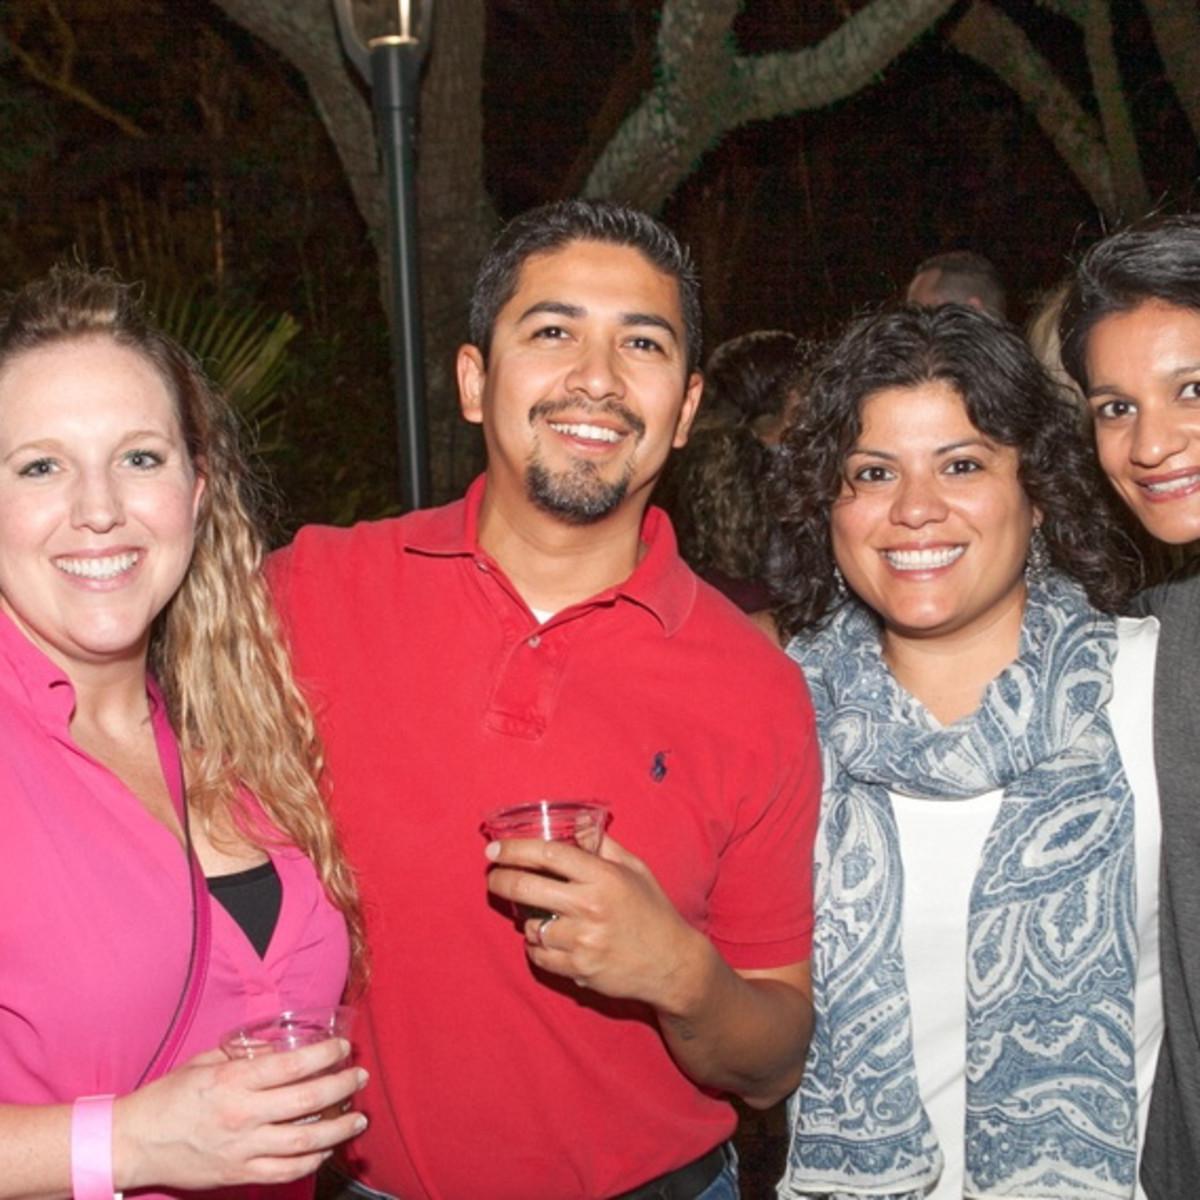 Houston Zoo YP Emily Brandts, Damian Gonzales, Sandy Trevino, Rahkee Sharma